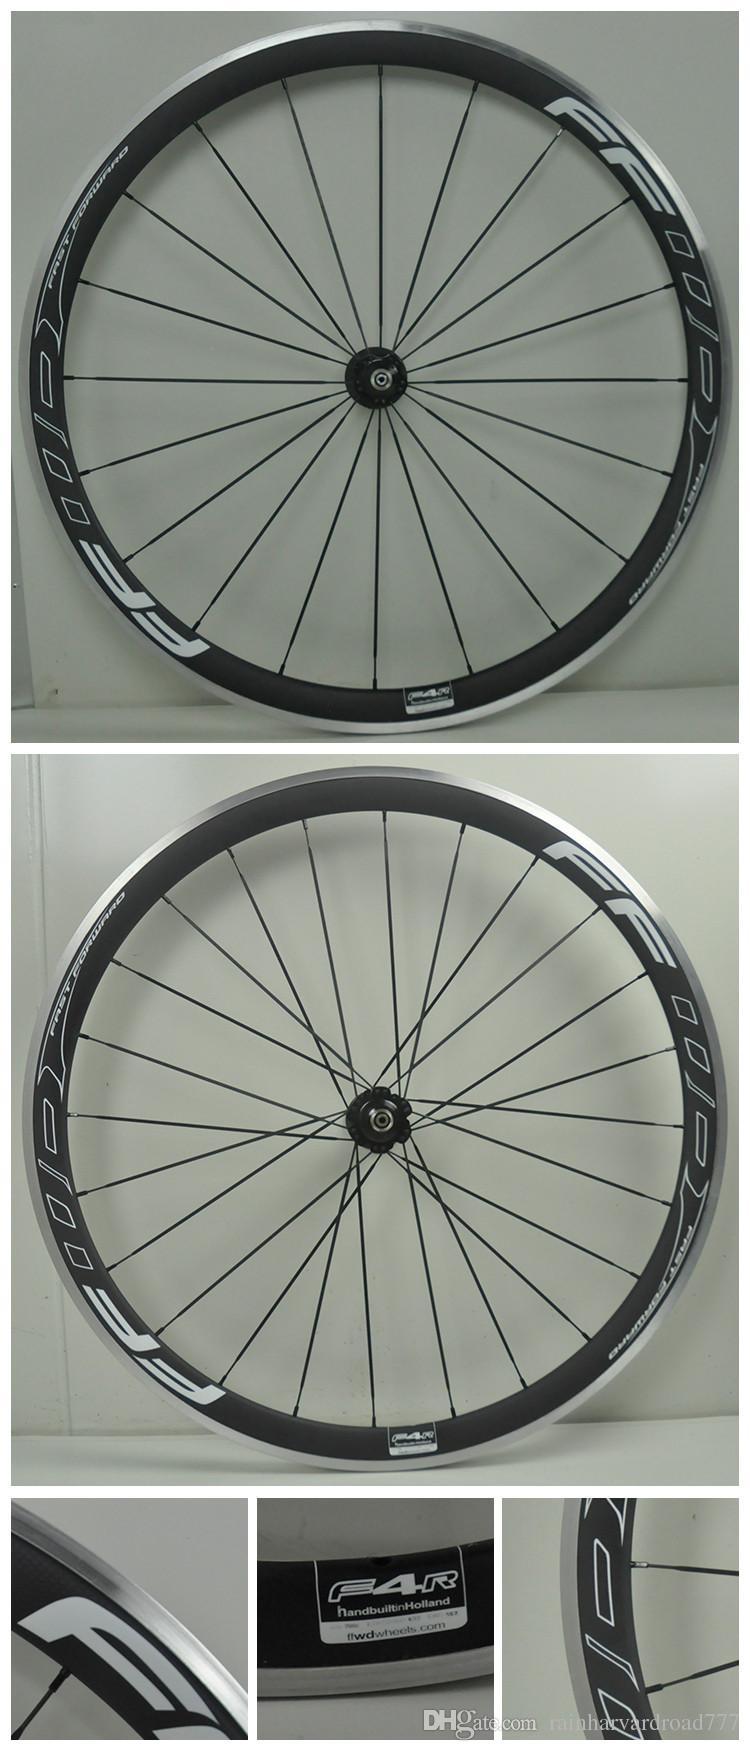 2016 stil Yol Bisikleti 38mm FFWD alaşım karbon fiber bisiklet tekerlek alaşım fren yüzeyi ile, Powerway Hub Karbon Hub Seramik Hub mevcuttur